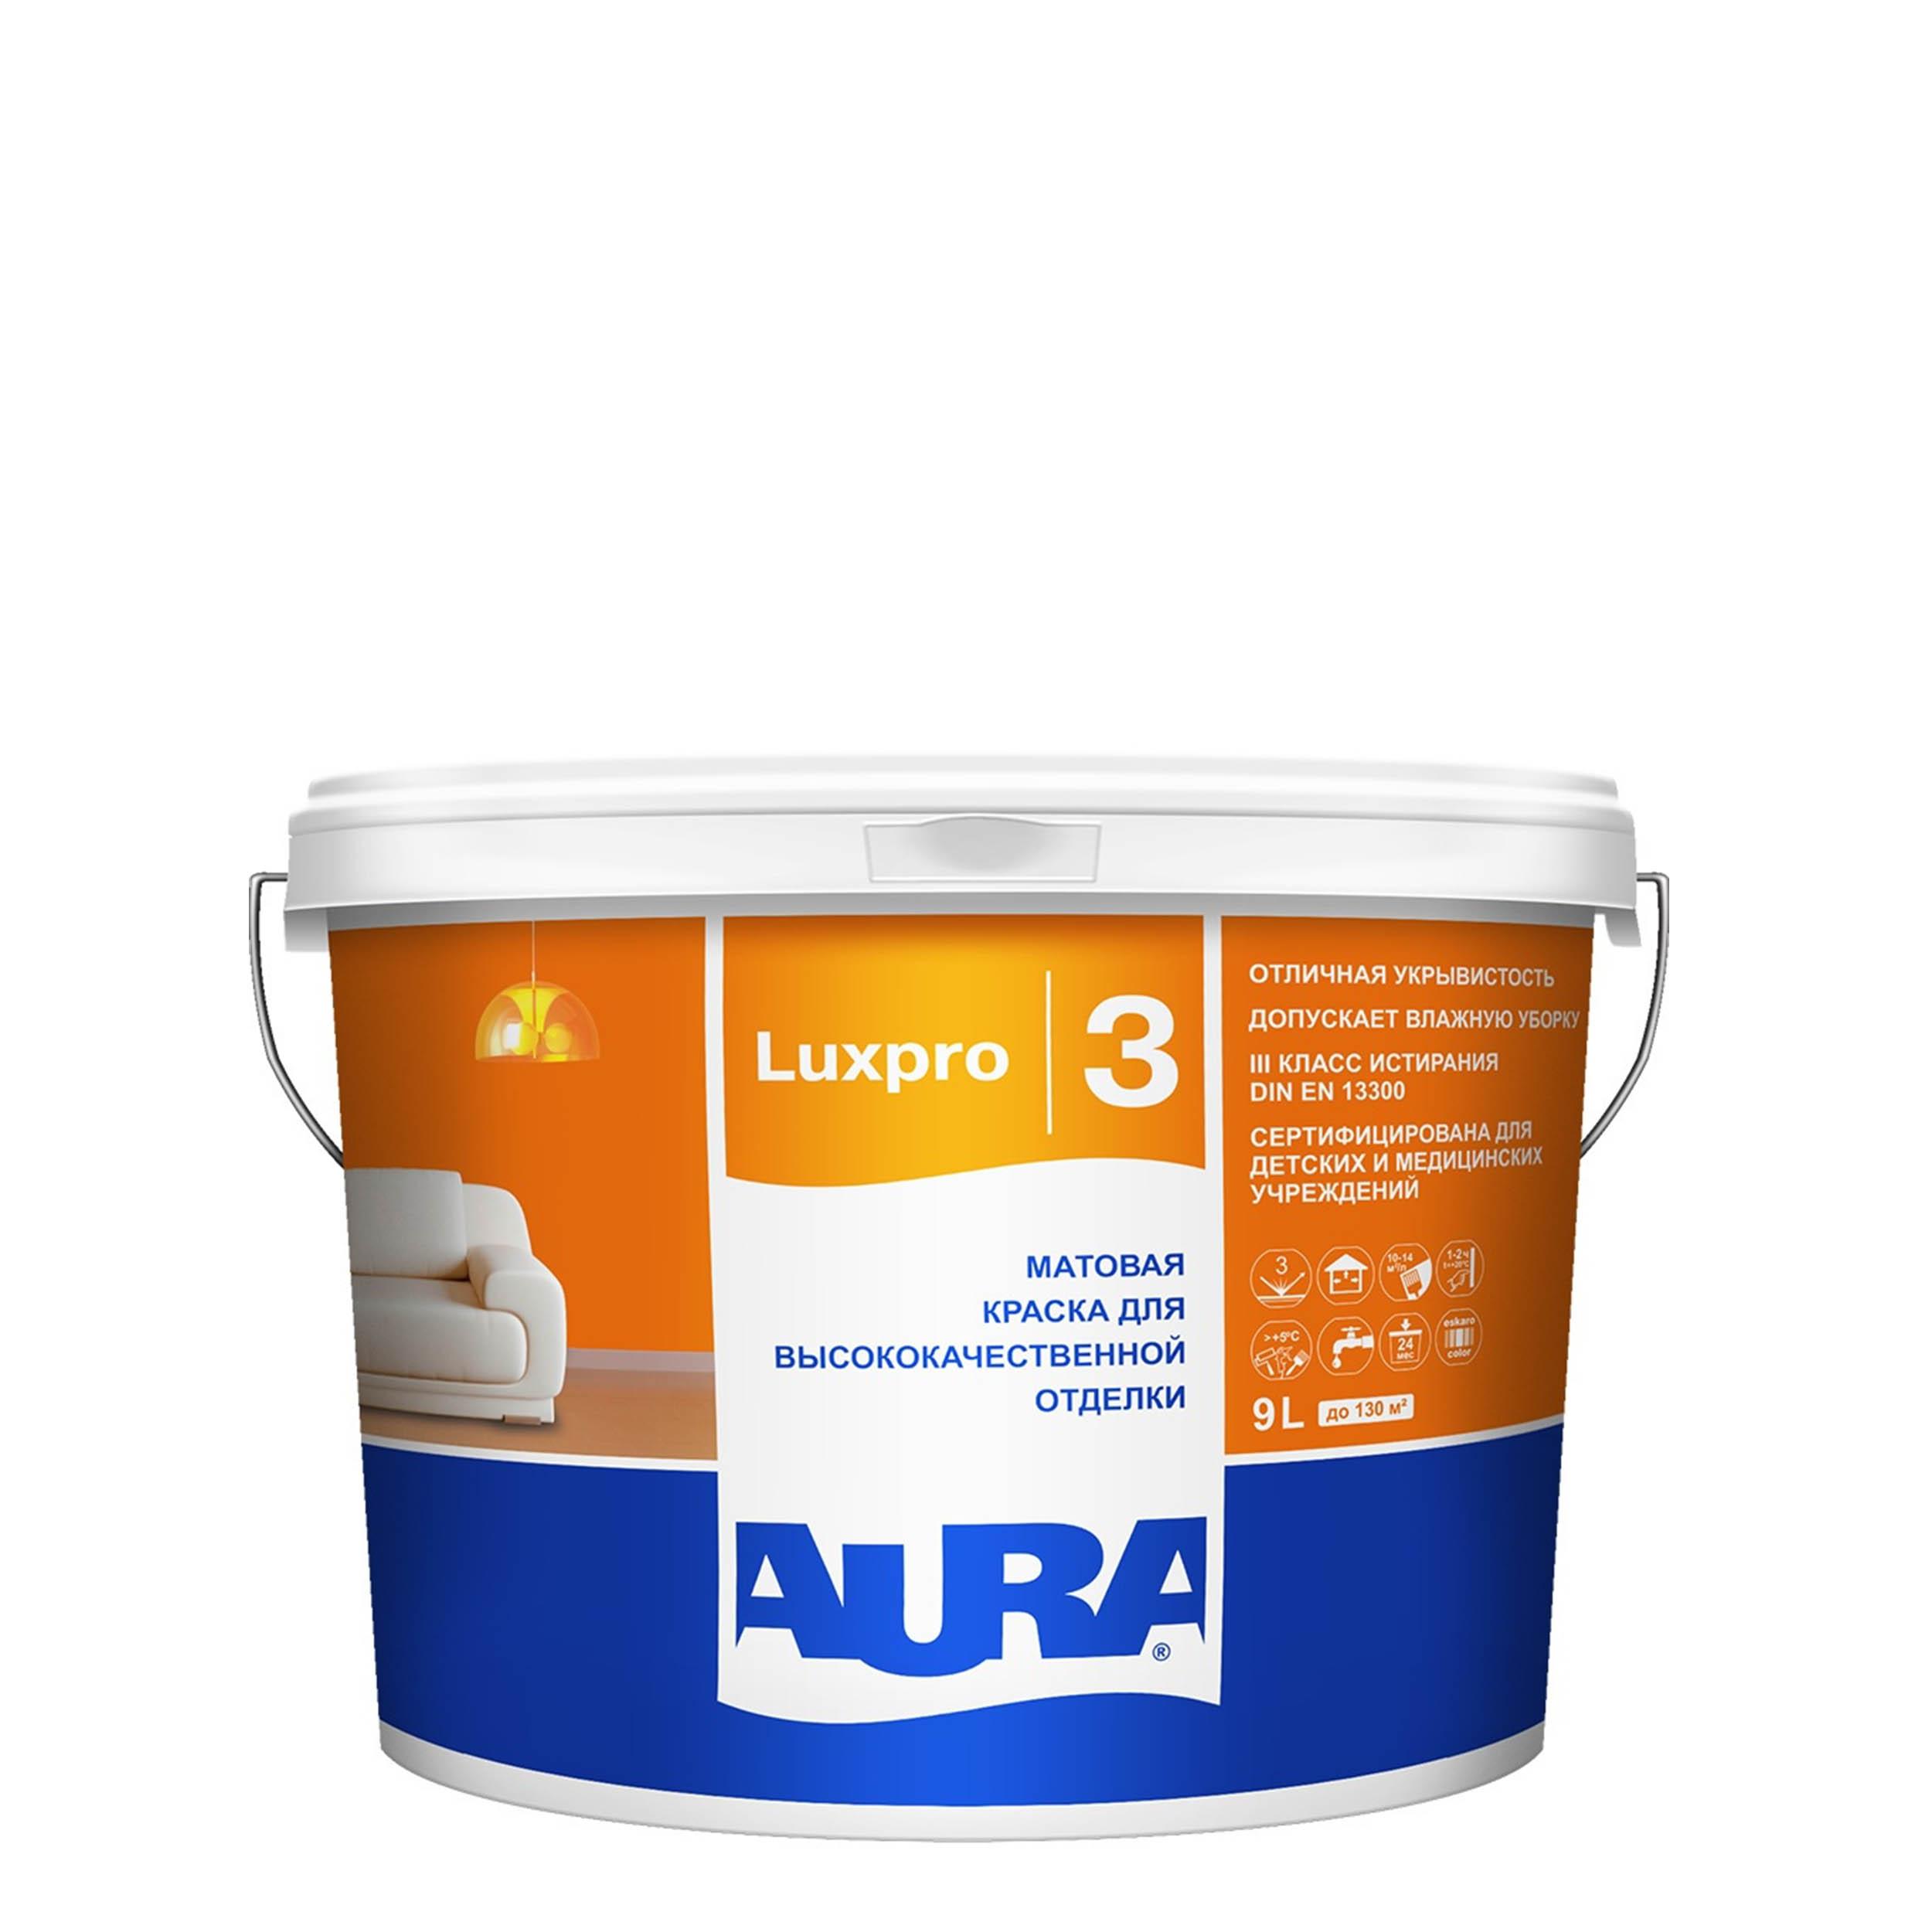 Фото 12 - Краска интерьерная, Aura LuxPRO 3, RAL 1014, 11 кг.